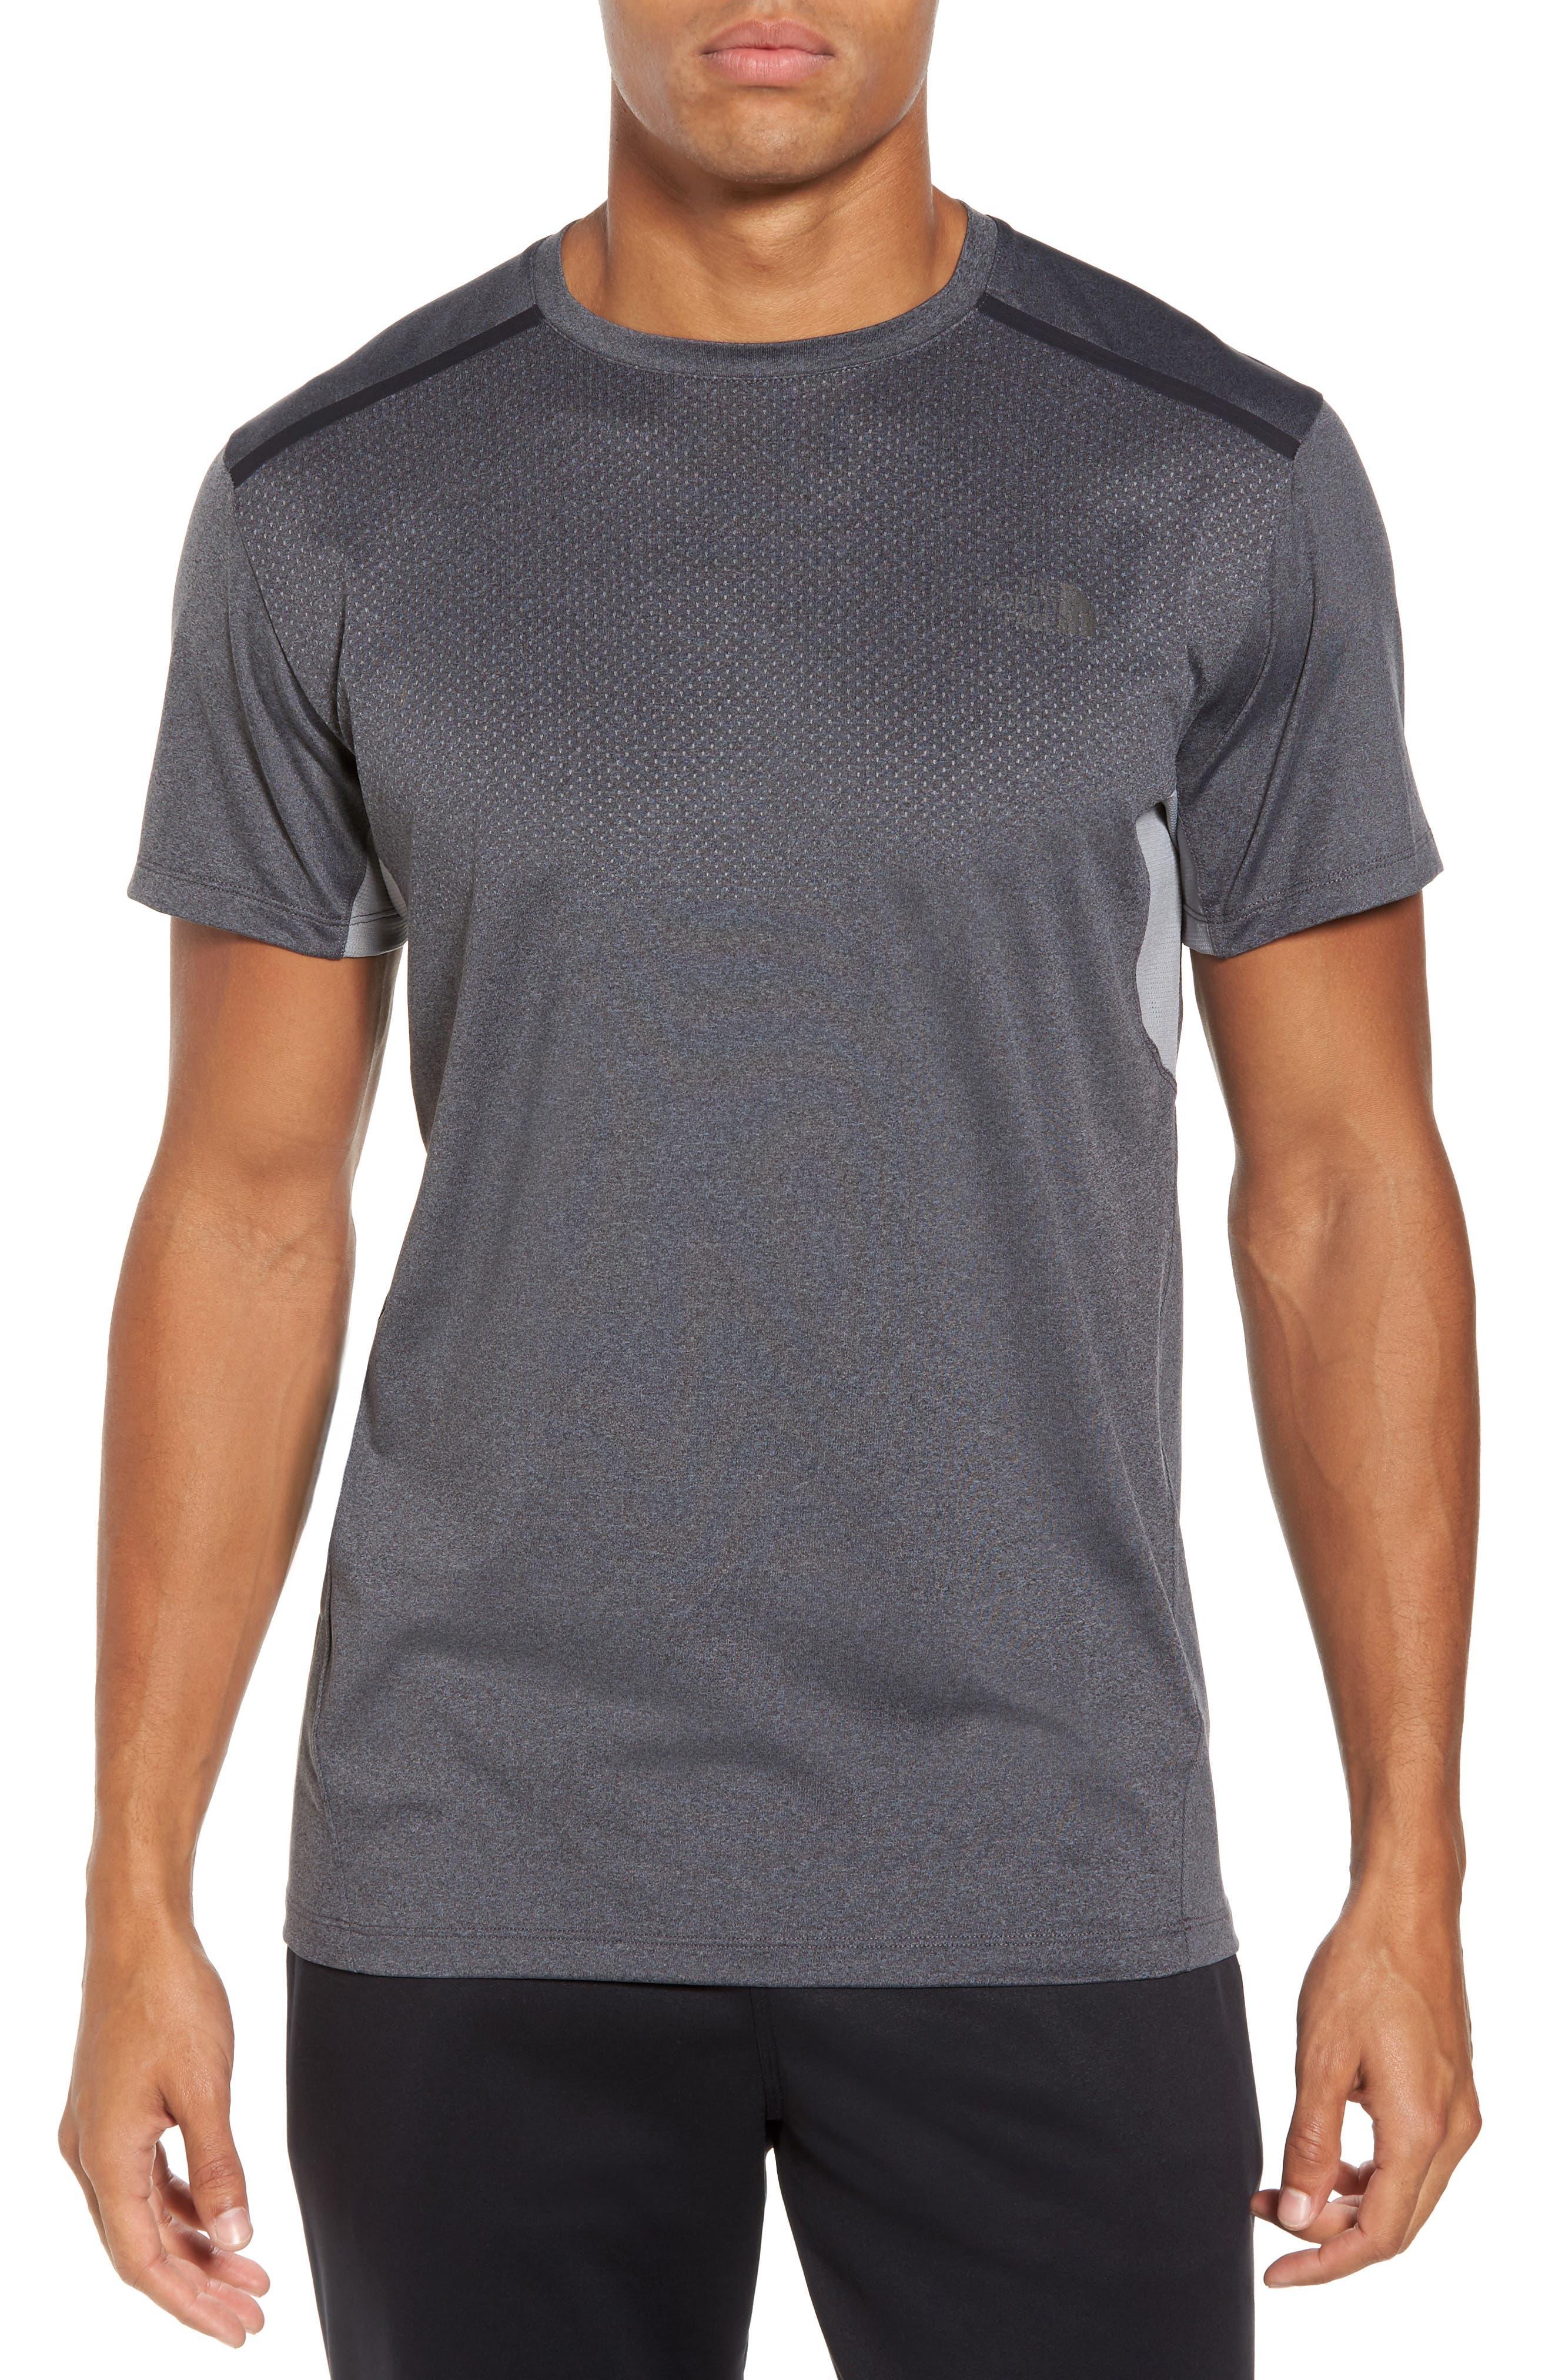 The North Face 'Kilowatt' Performance T-Shirt